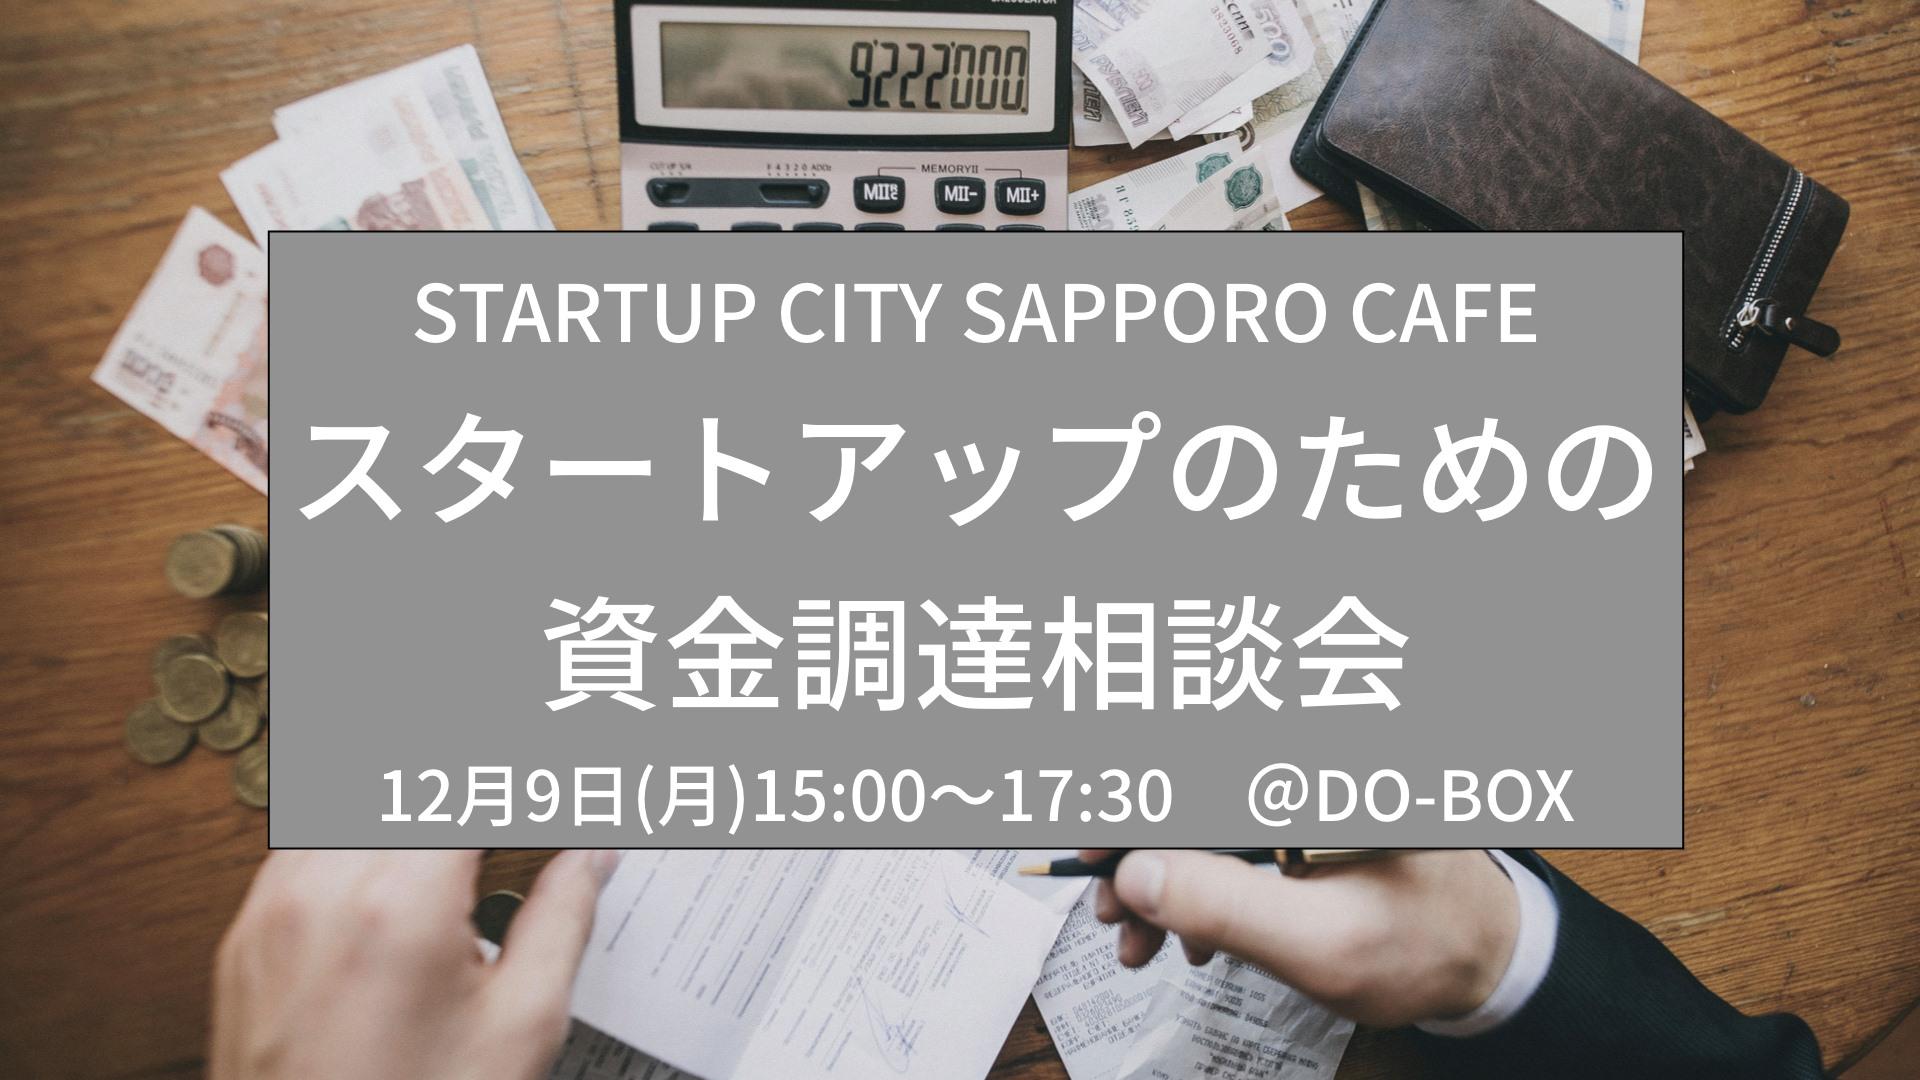 STARTUP CITY SAPPORO CAFE #2 スタートアップのための資金調達相談会